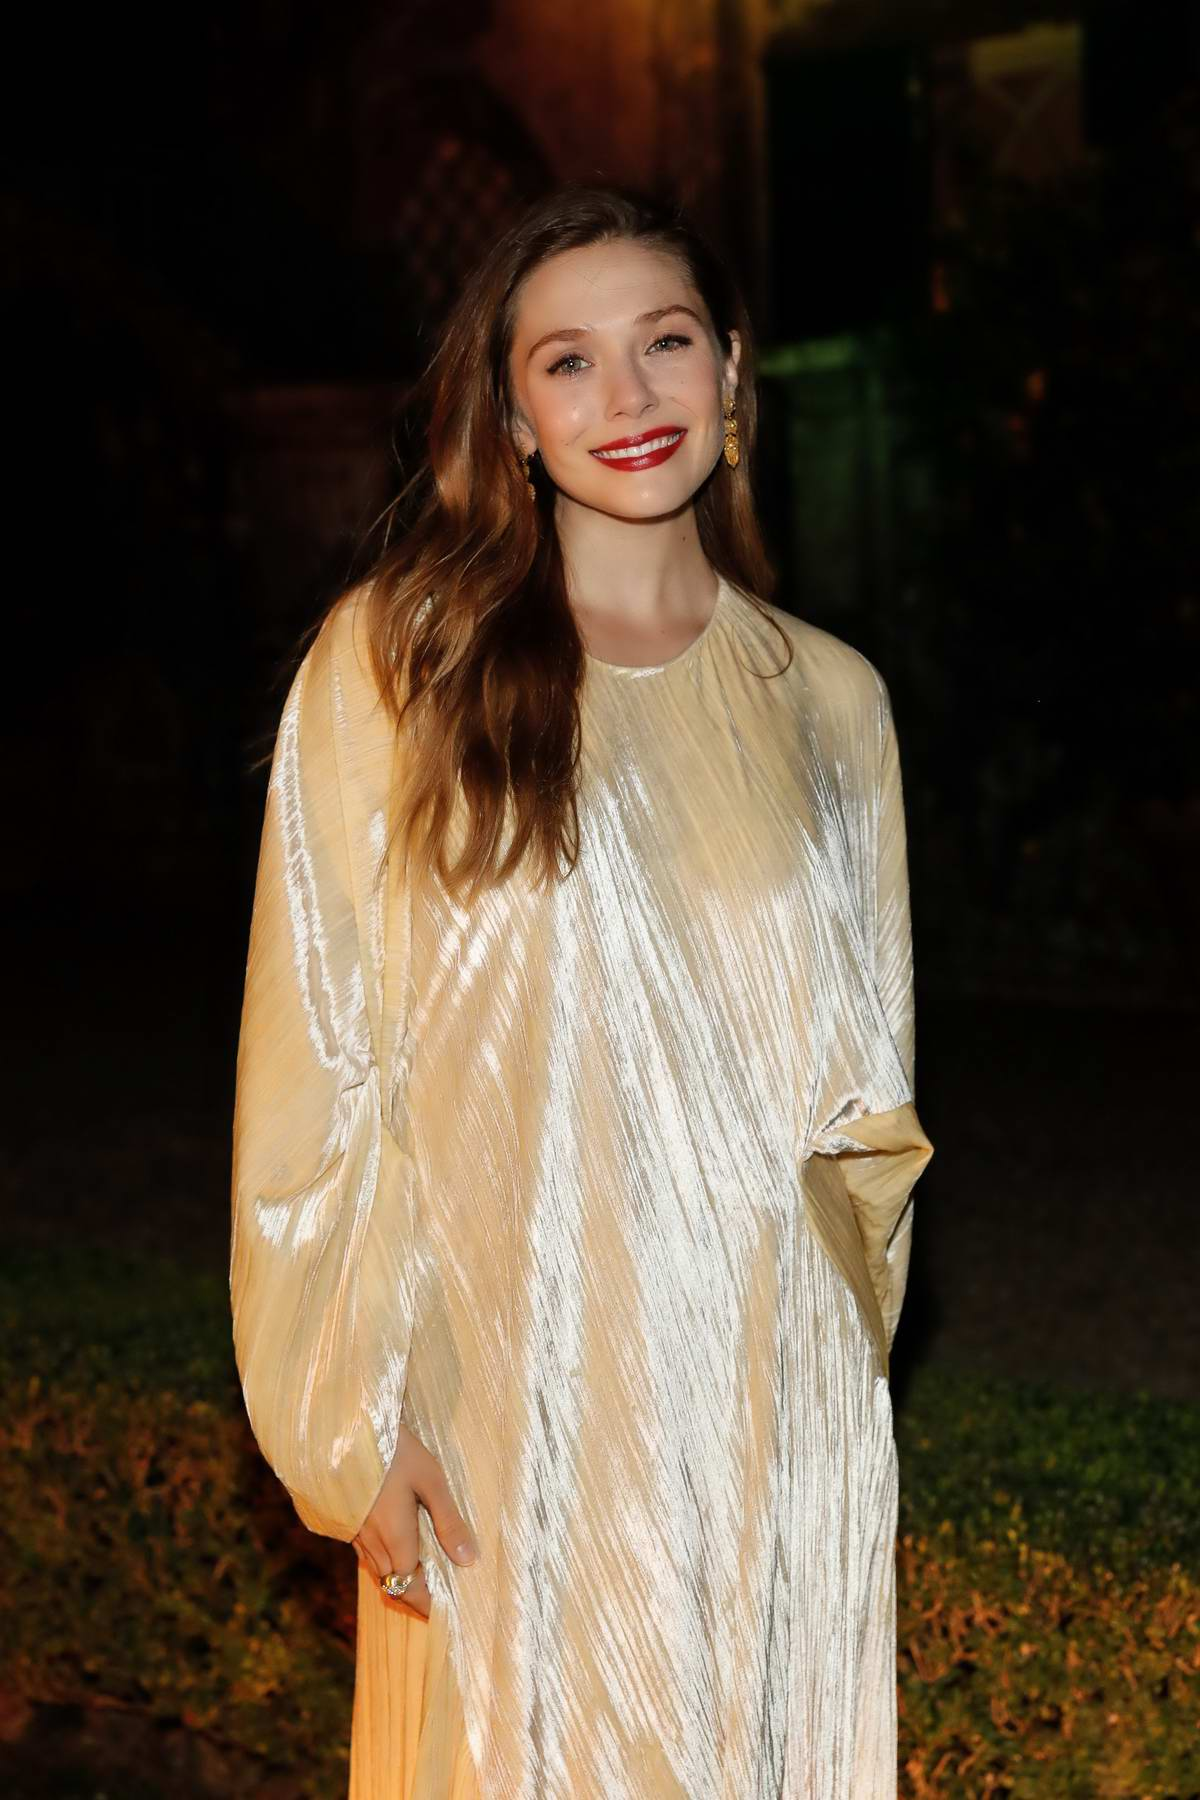 Elizabeth Olsen at 3rd annual Rosetta Getty's Tuscany weekend in Italy